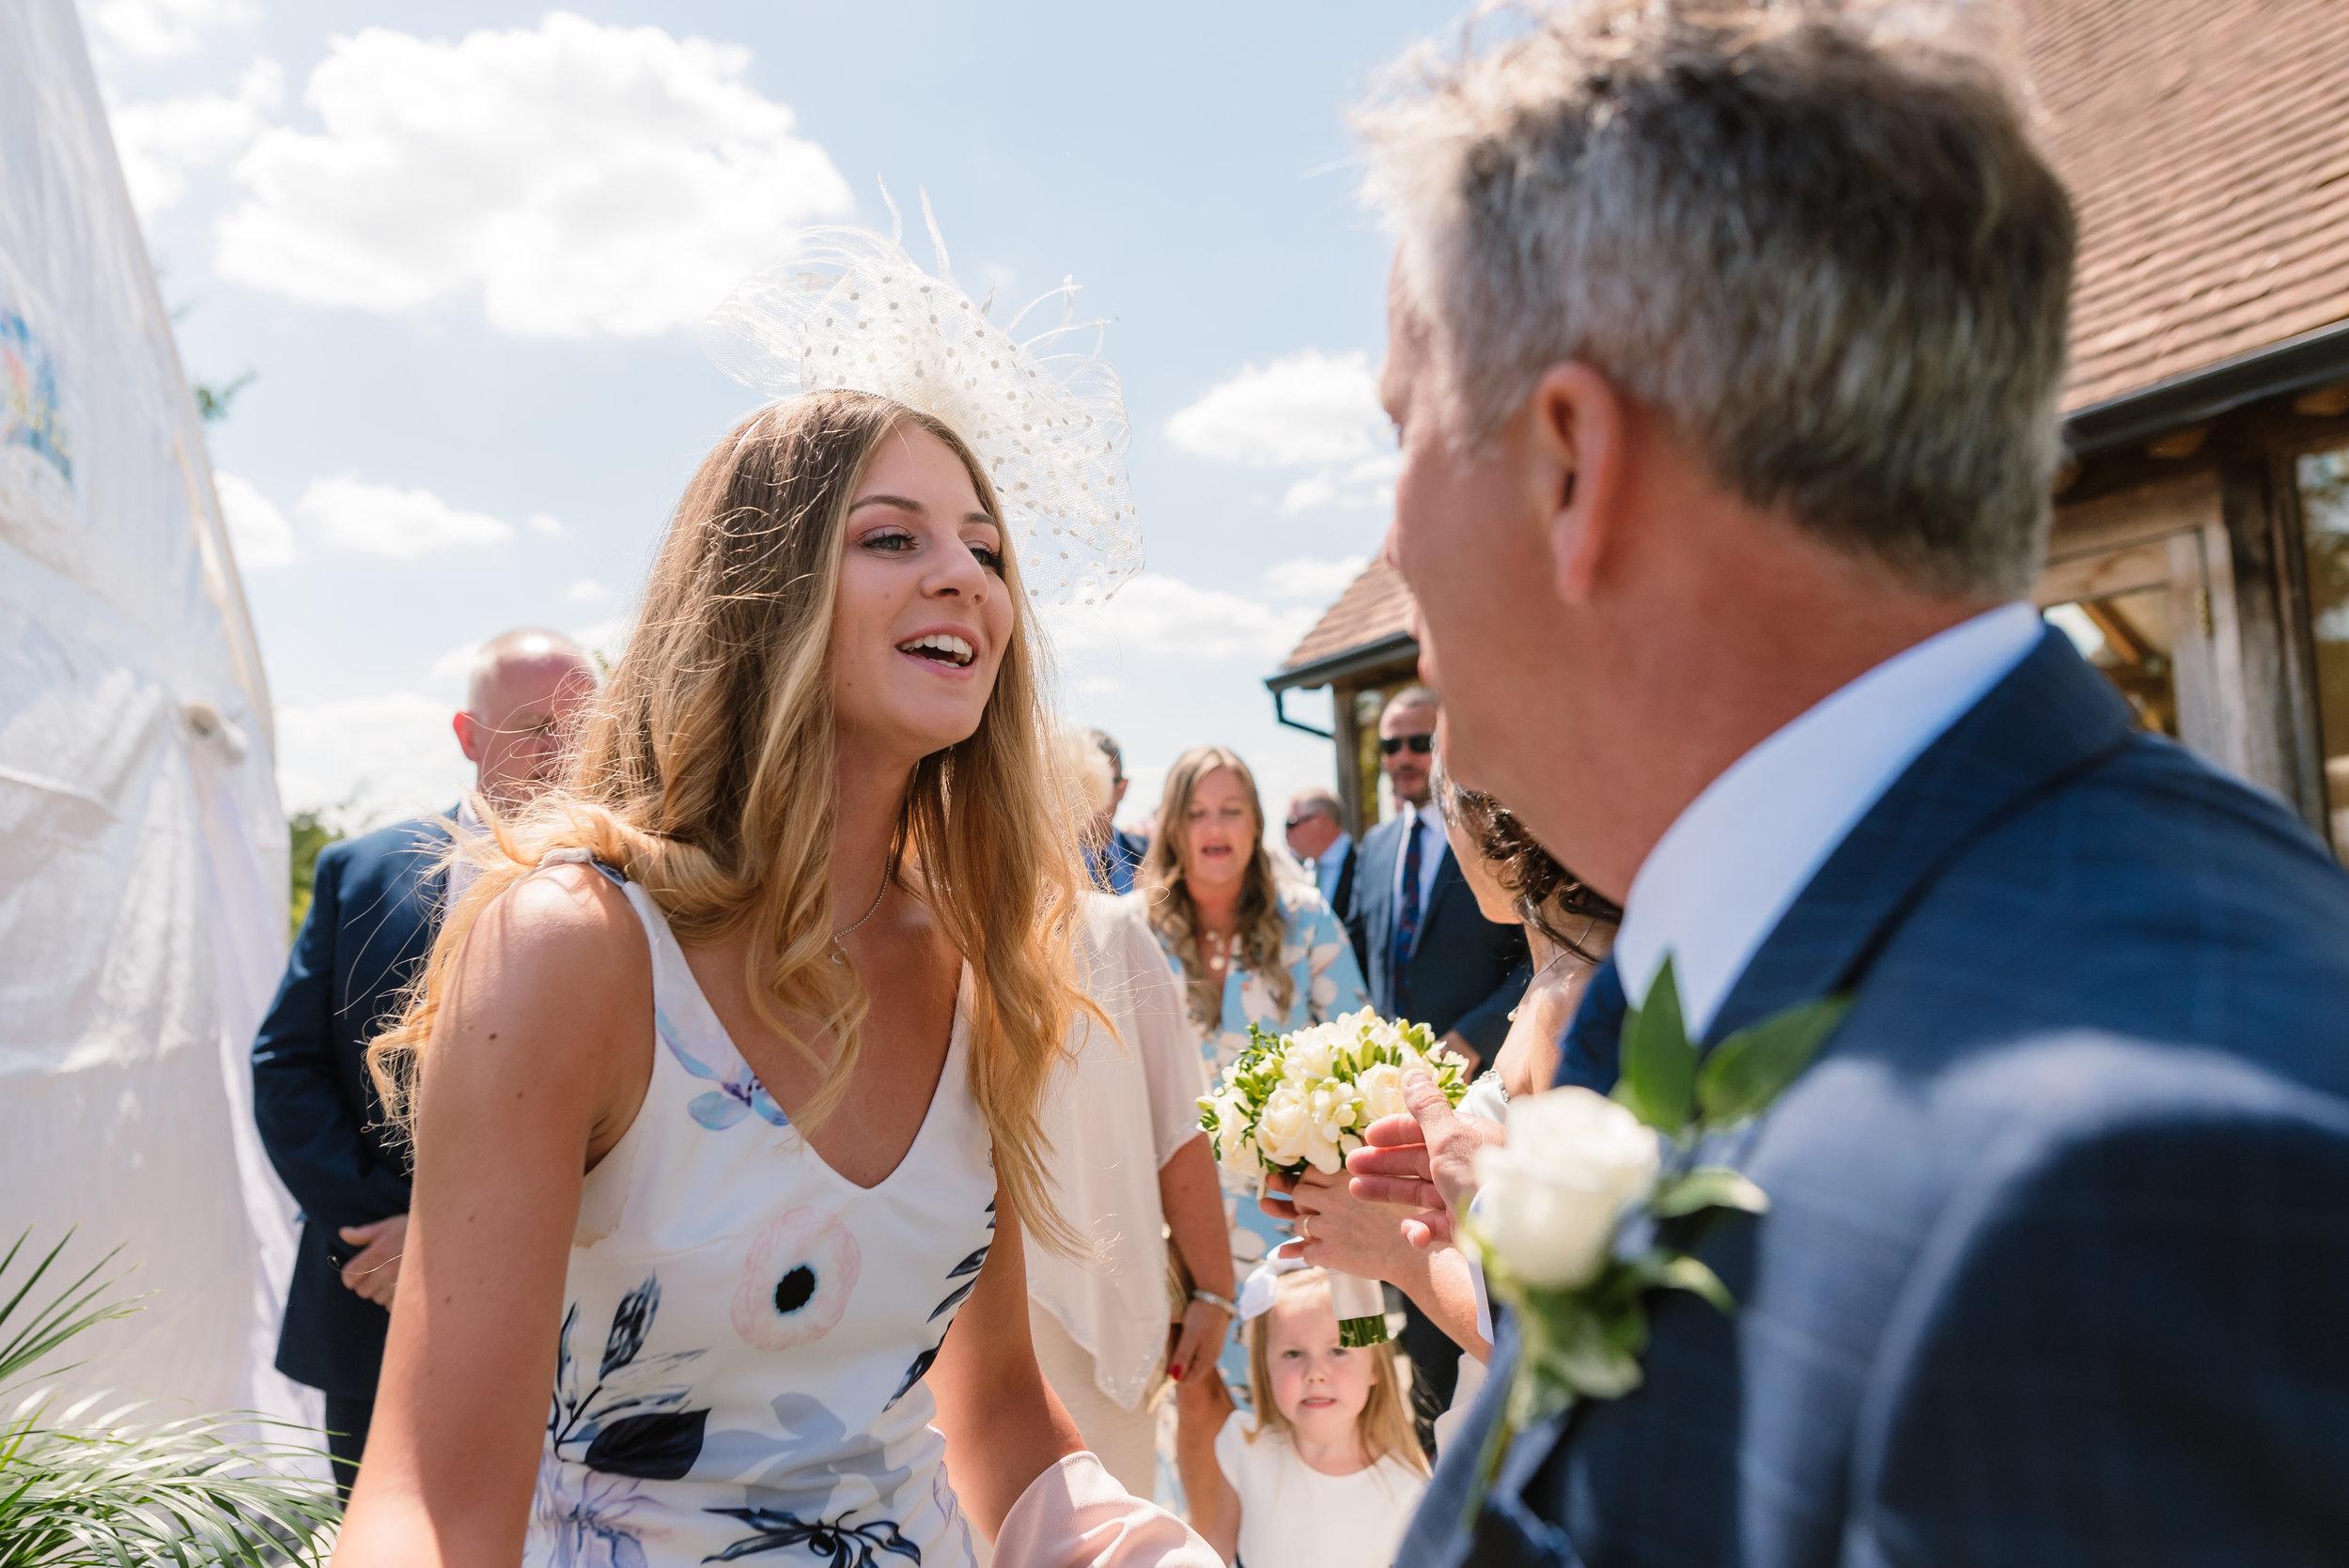 Hampshire-wedding-photographer-hampshire-surrey / Sarah-fishlock-photography / Groomed-Farm-Wedding-Venue-Hampshire / Farm-wedding-venue-hampshire / farm-wedding-venues-surrey